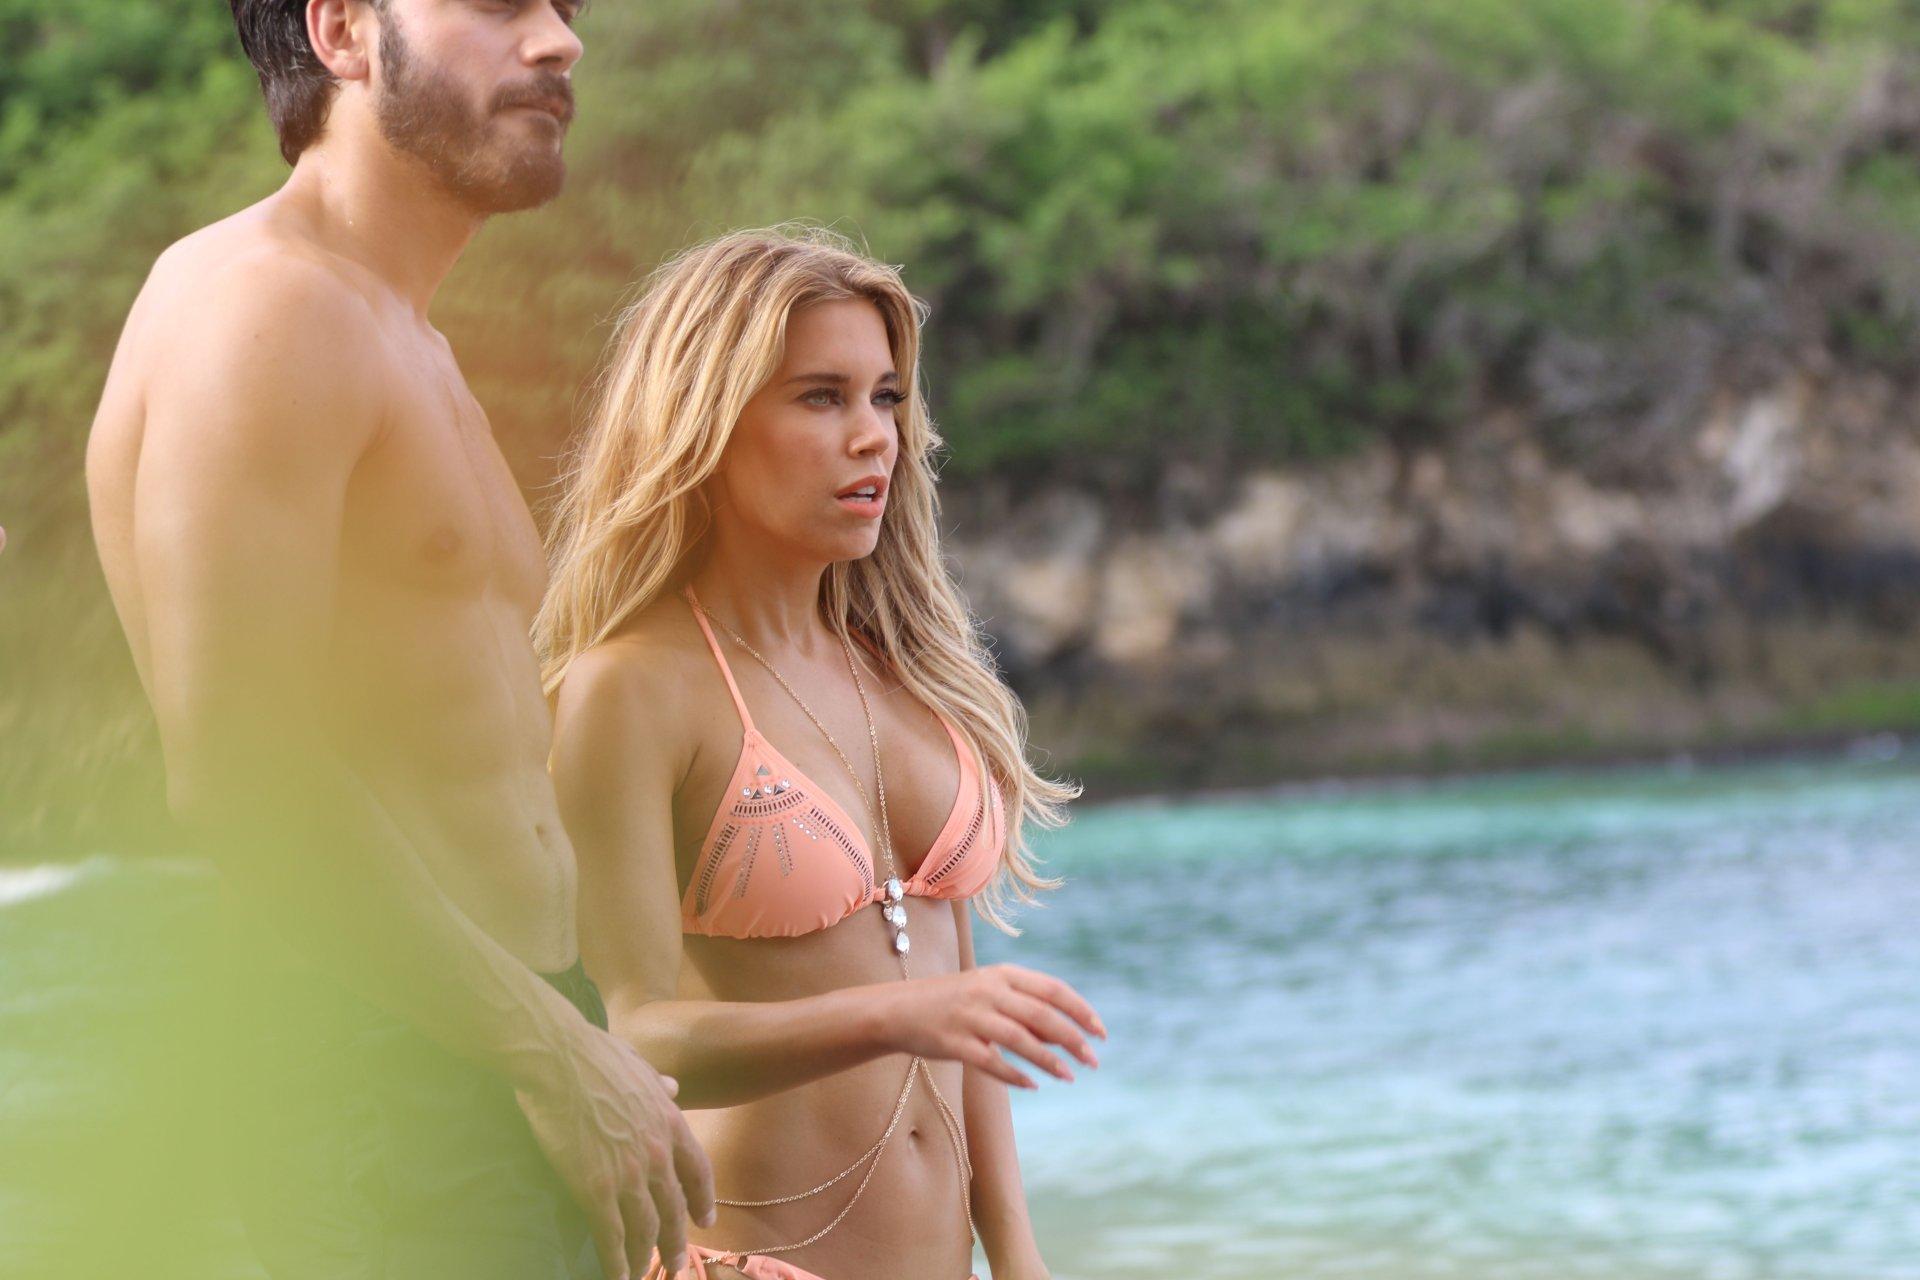 leaked Kourtney nudes kardashian